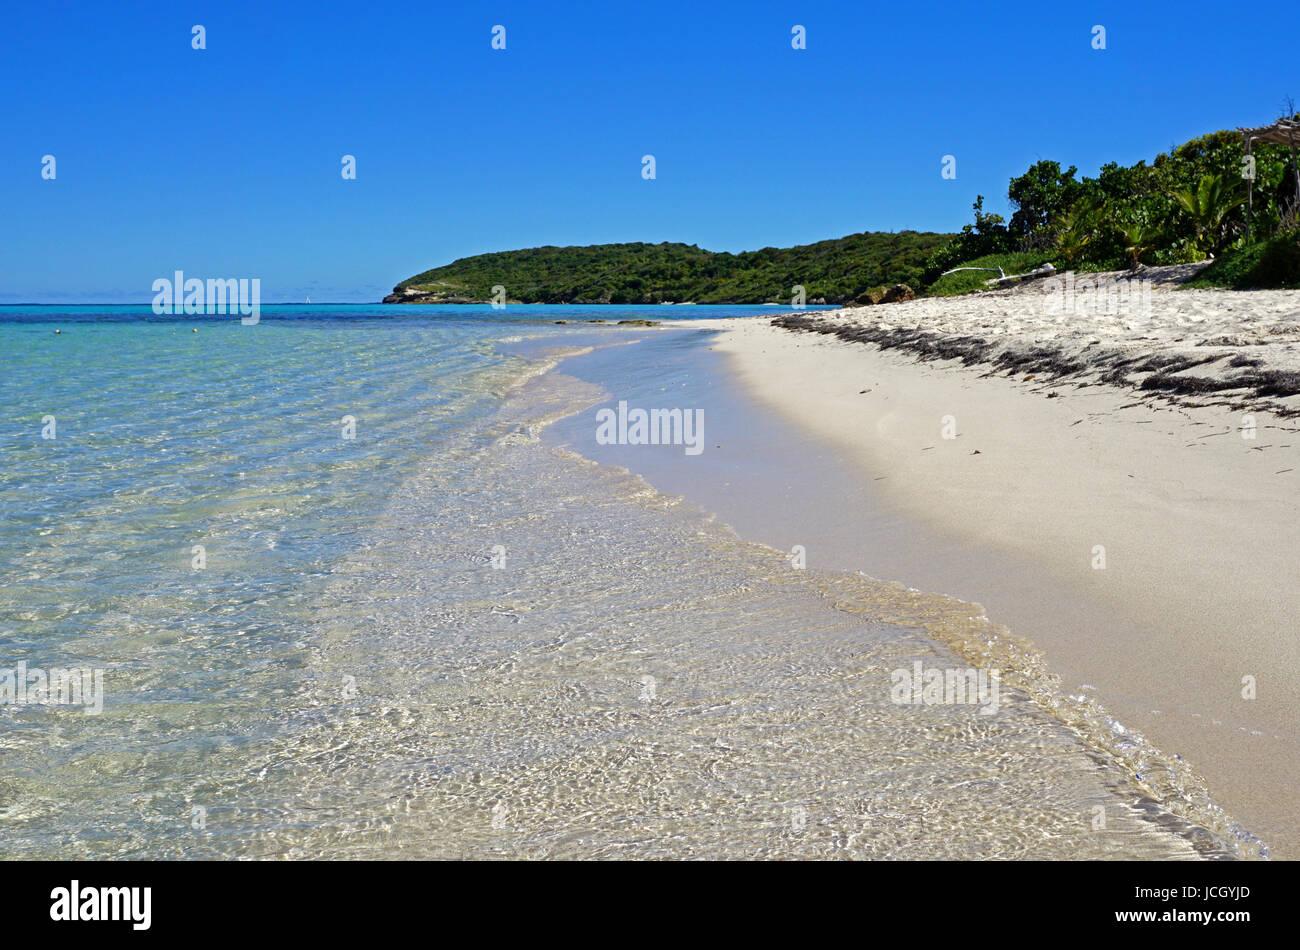 Green Island Beach - Stock Image